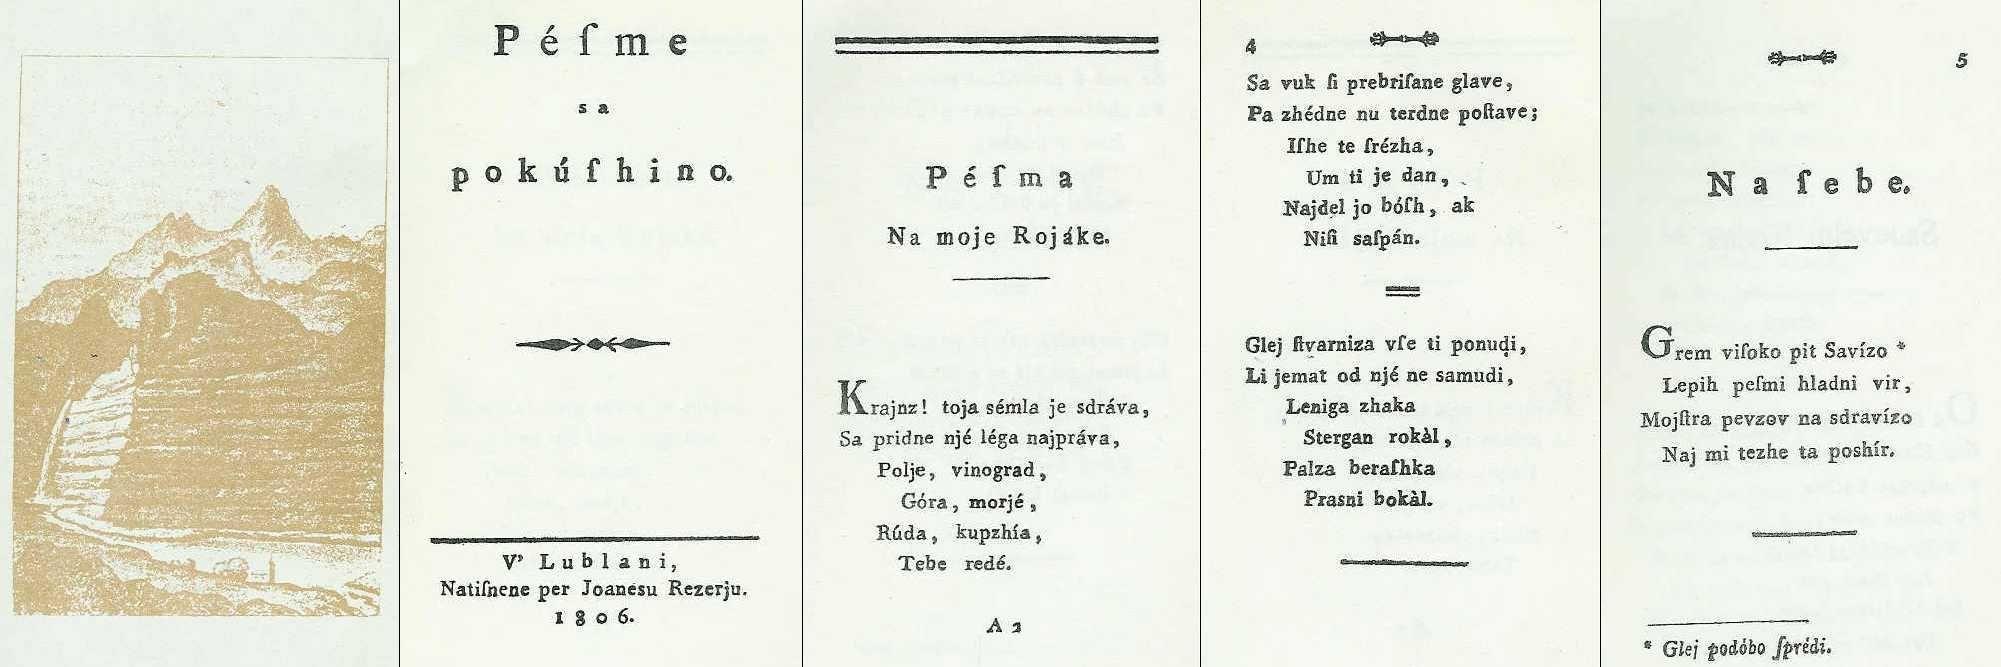 Valentin Vodnik's poetry #ValentinVodnik #Slovenia #SloveniaHistory #SloveniaCulture #visitSlovenia #Culture #poet